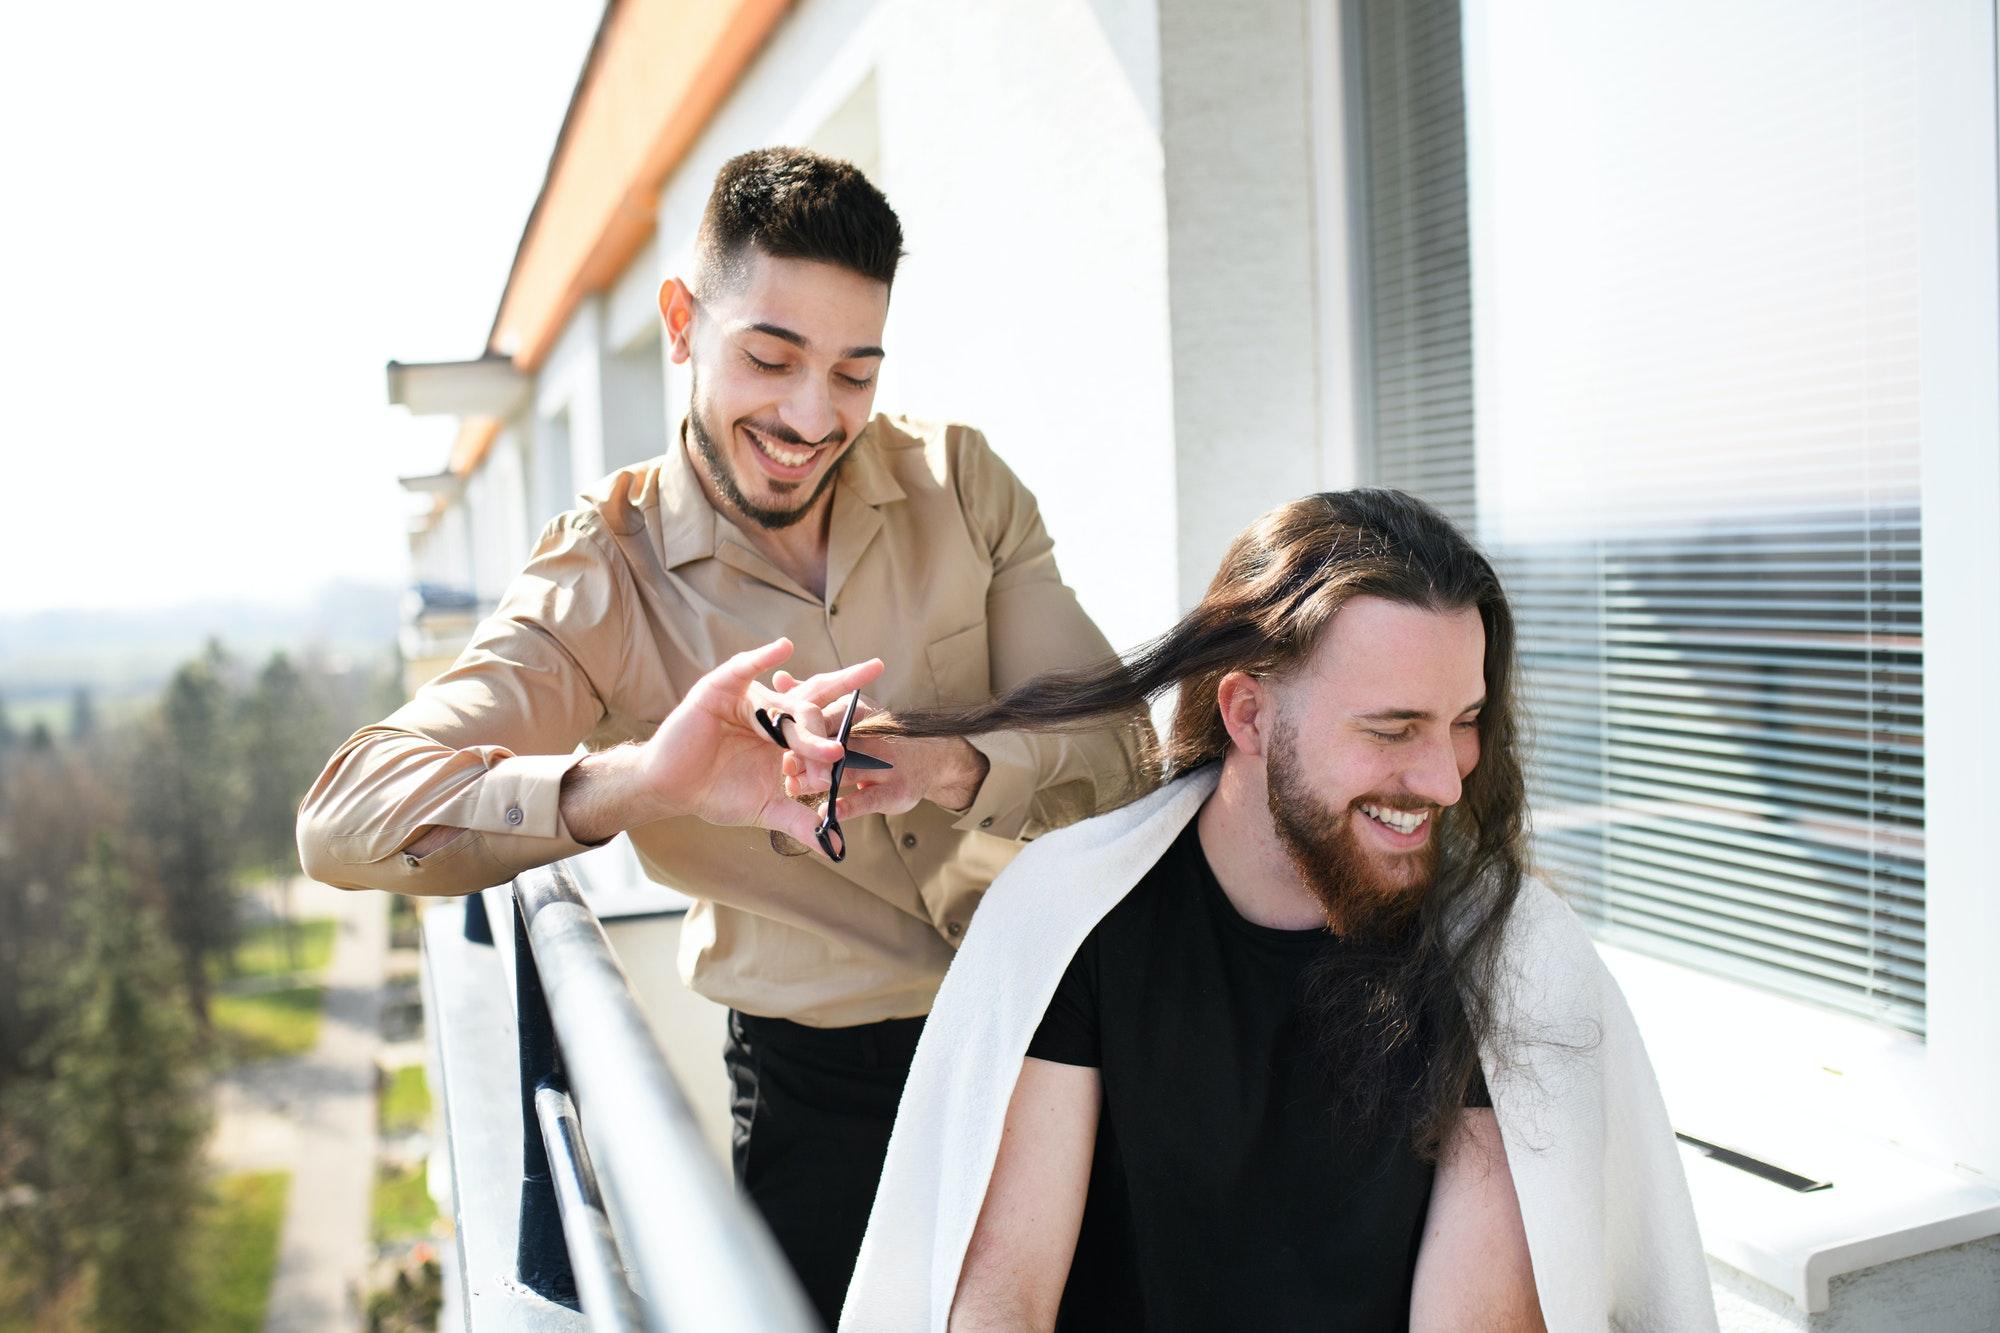 Haircut on balcony at home, coronavirus and lockdown concept